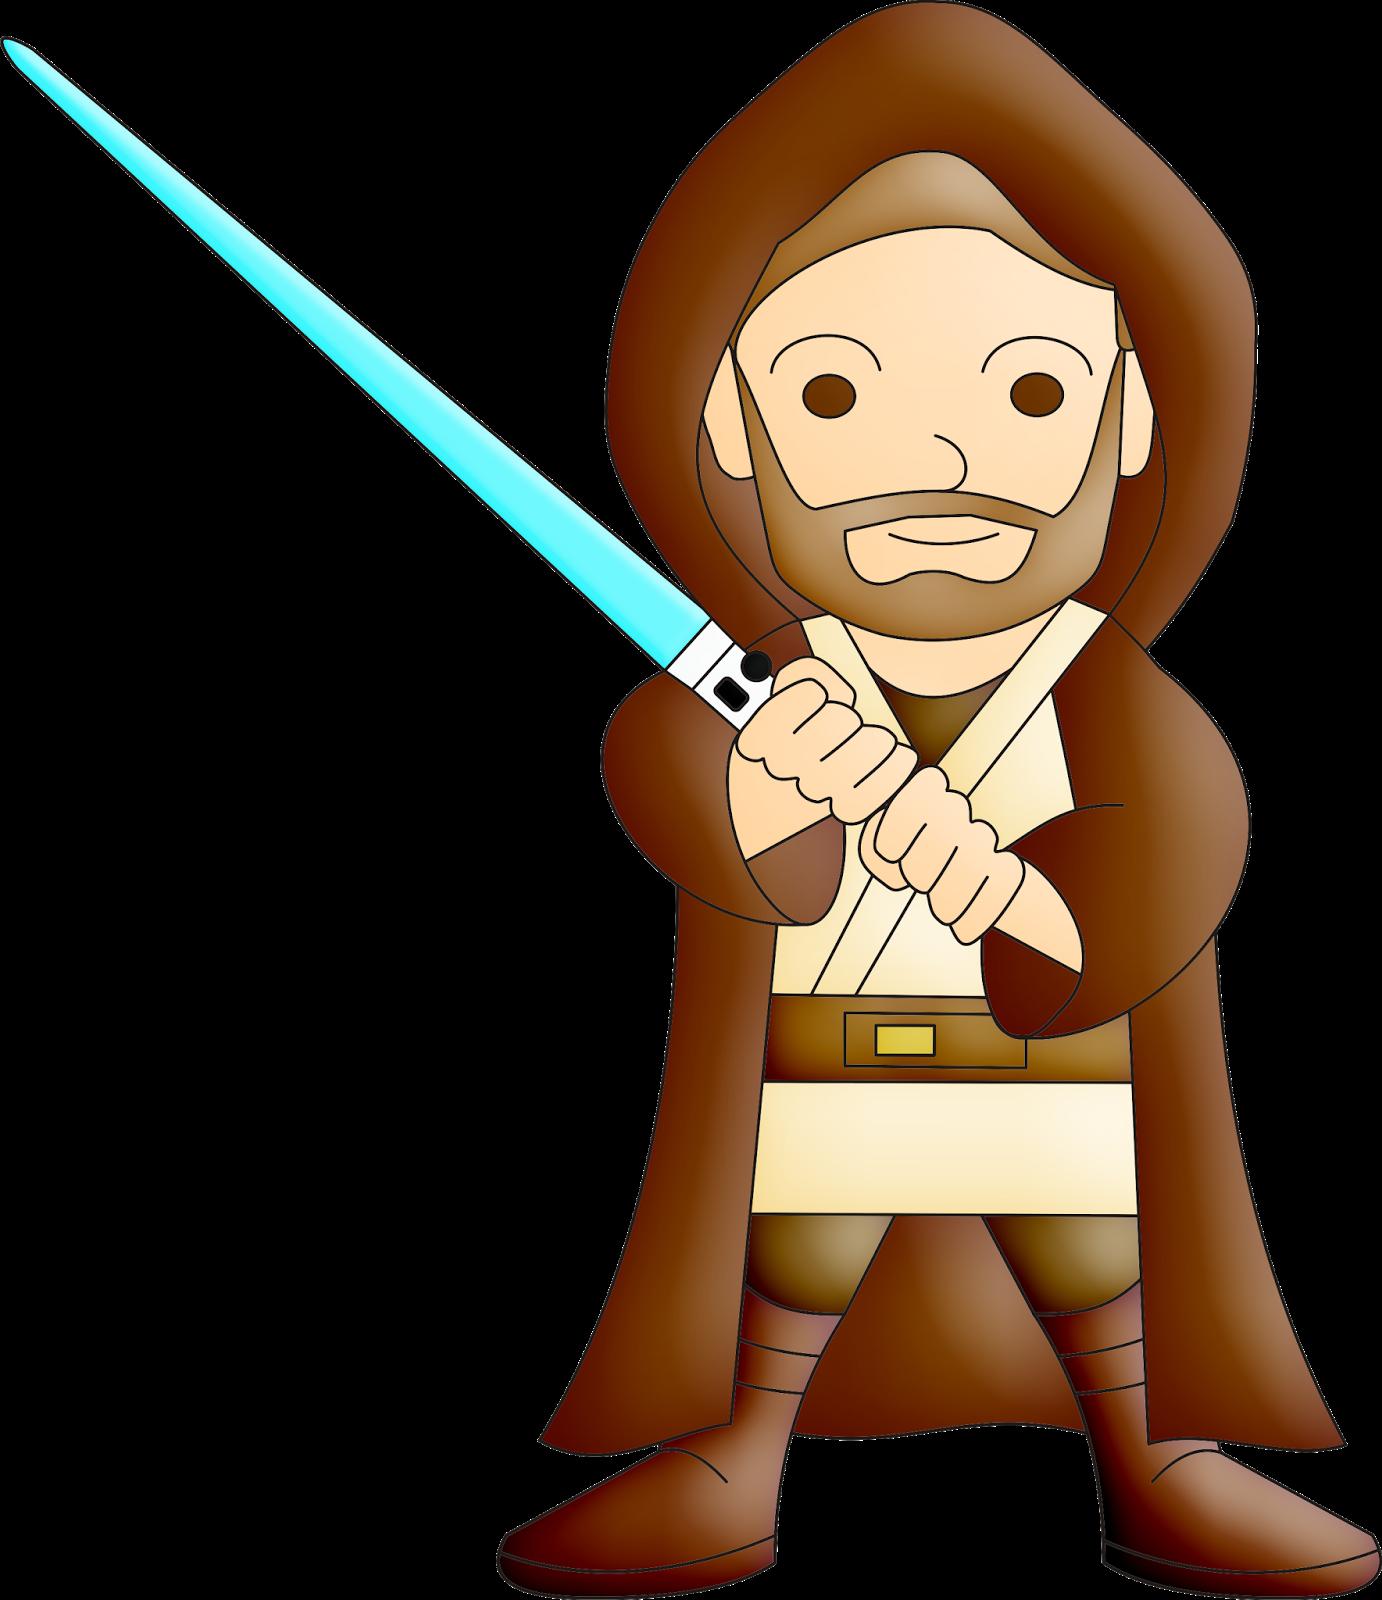 Obi wan kenobi chewbacca. Clipart free star wars